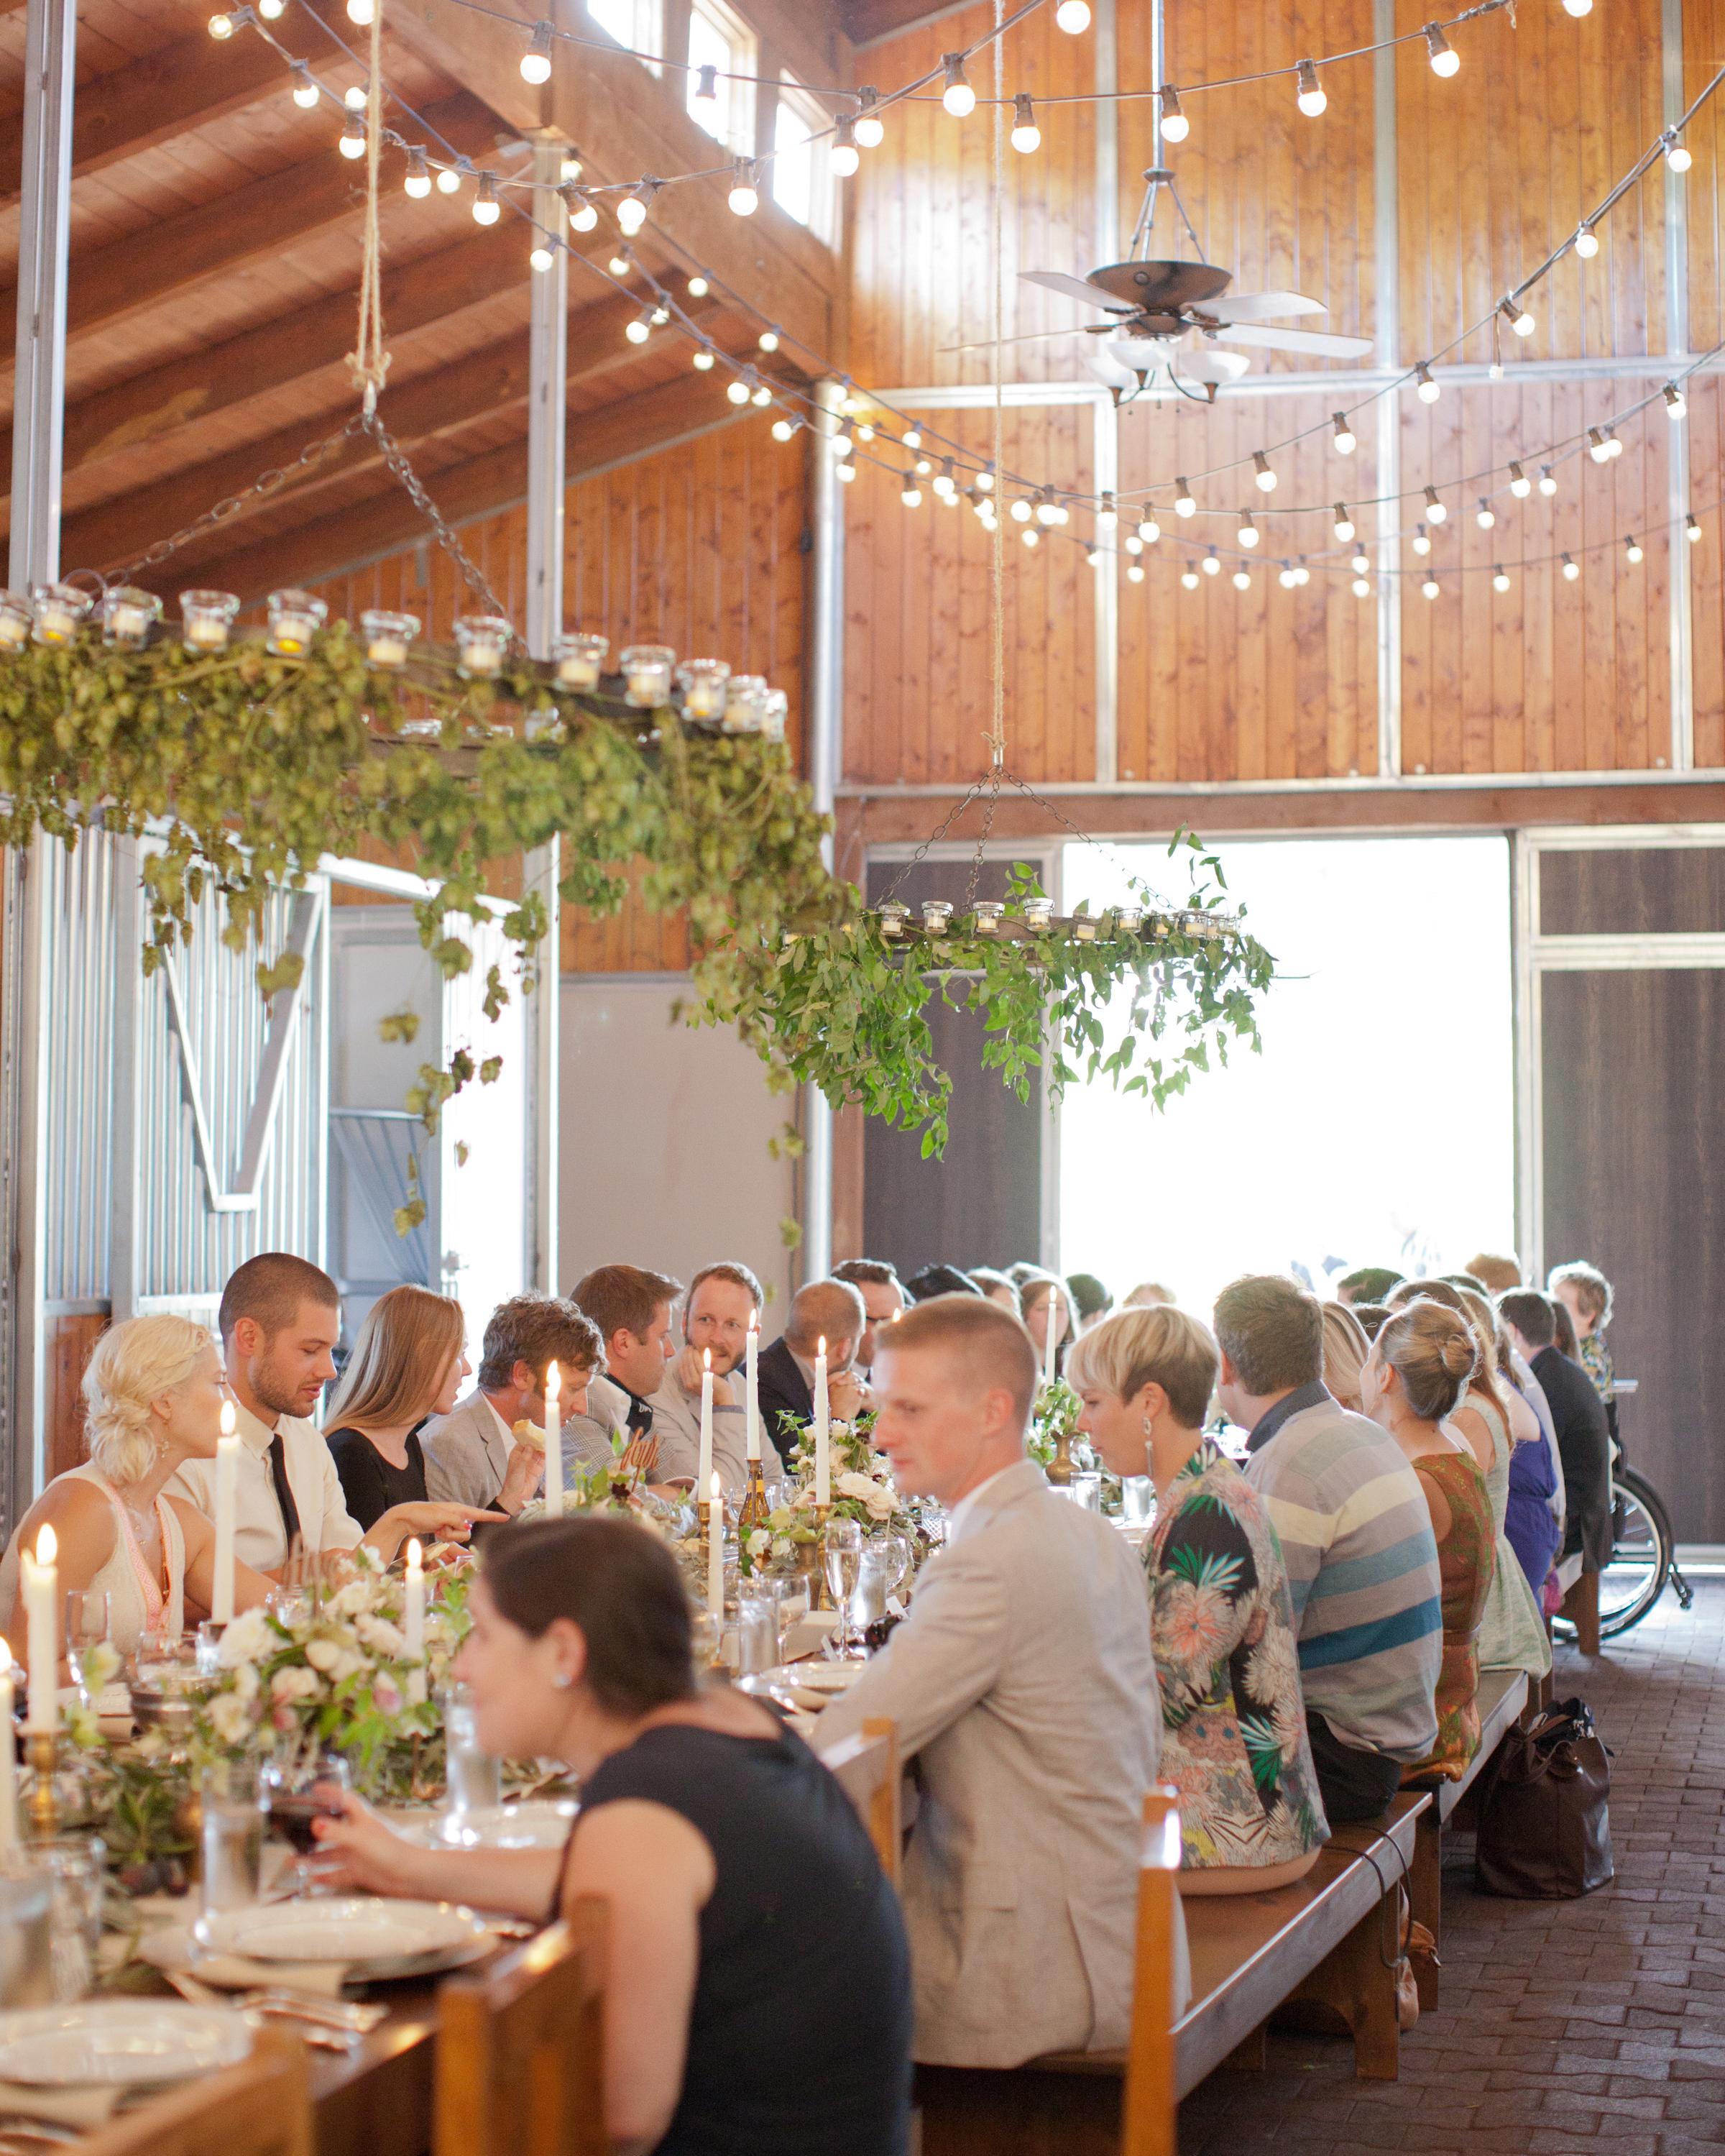 lizzy-pat-wedding-dinner-175-s111777-0115.jpg